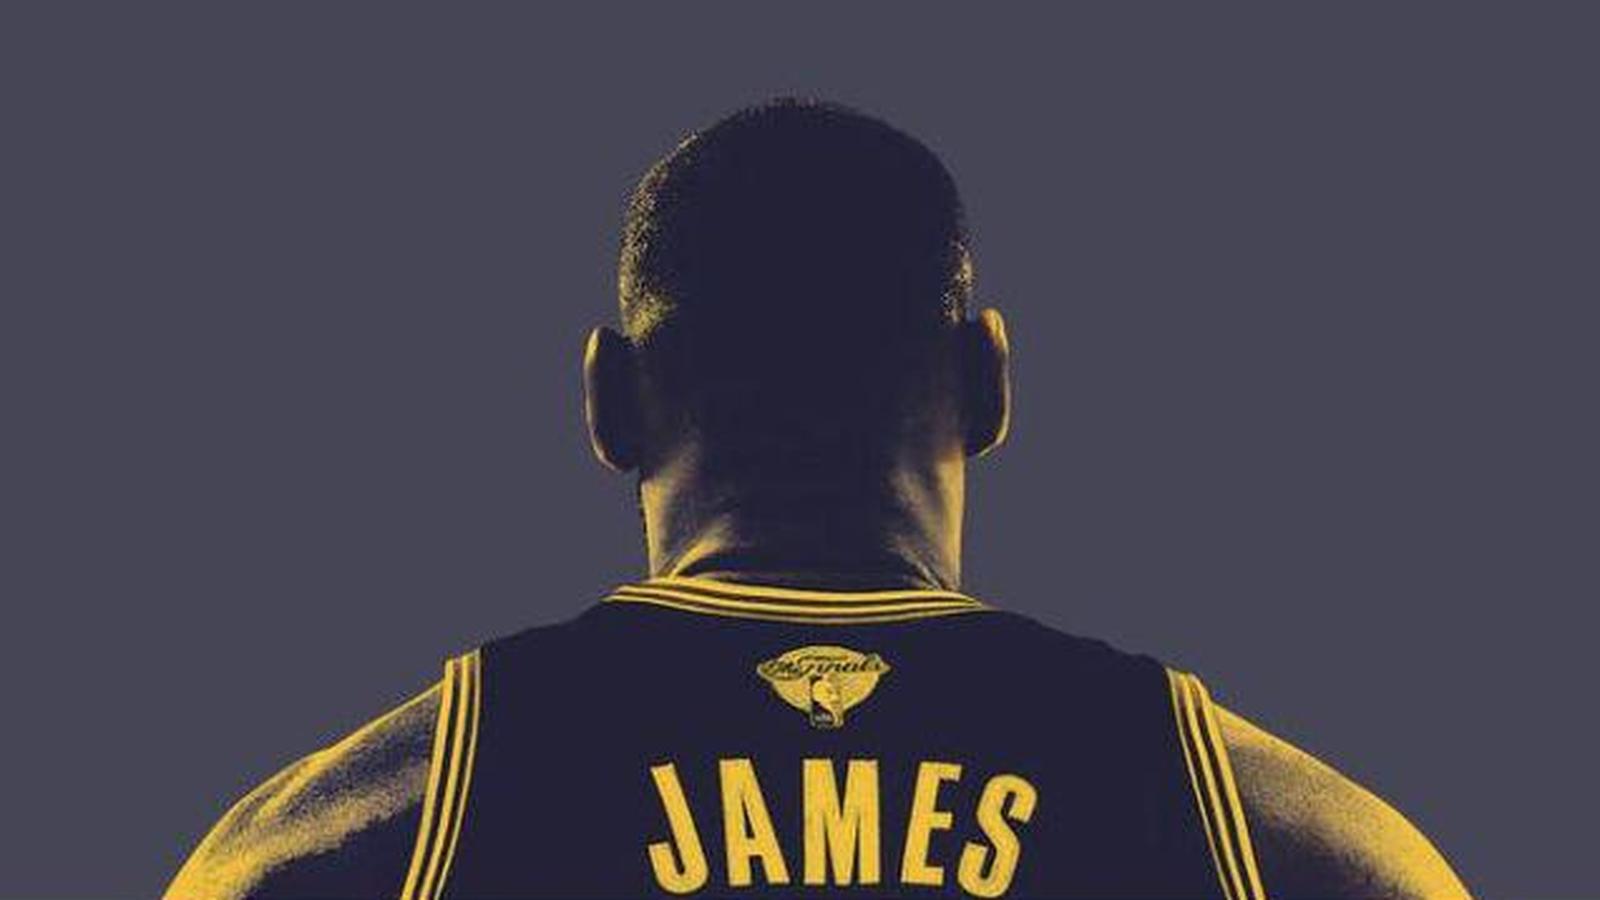 lebron james logo wallpaper - photo #27